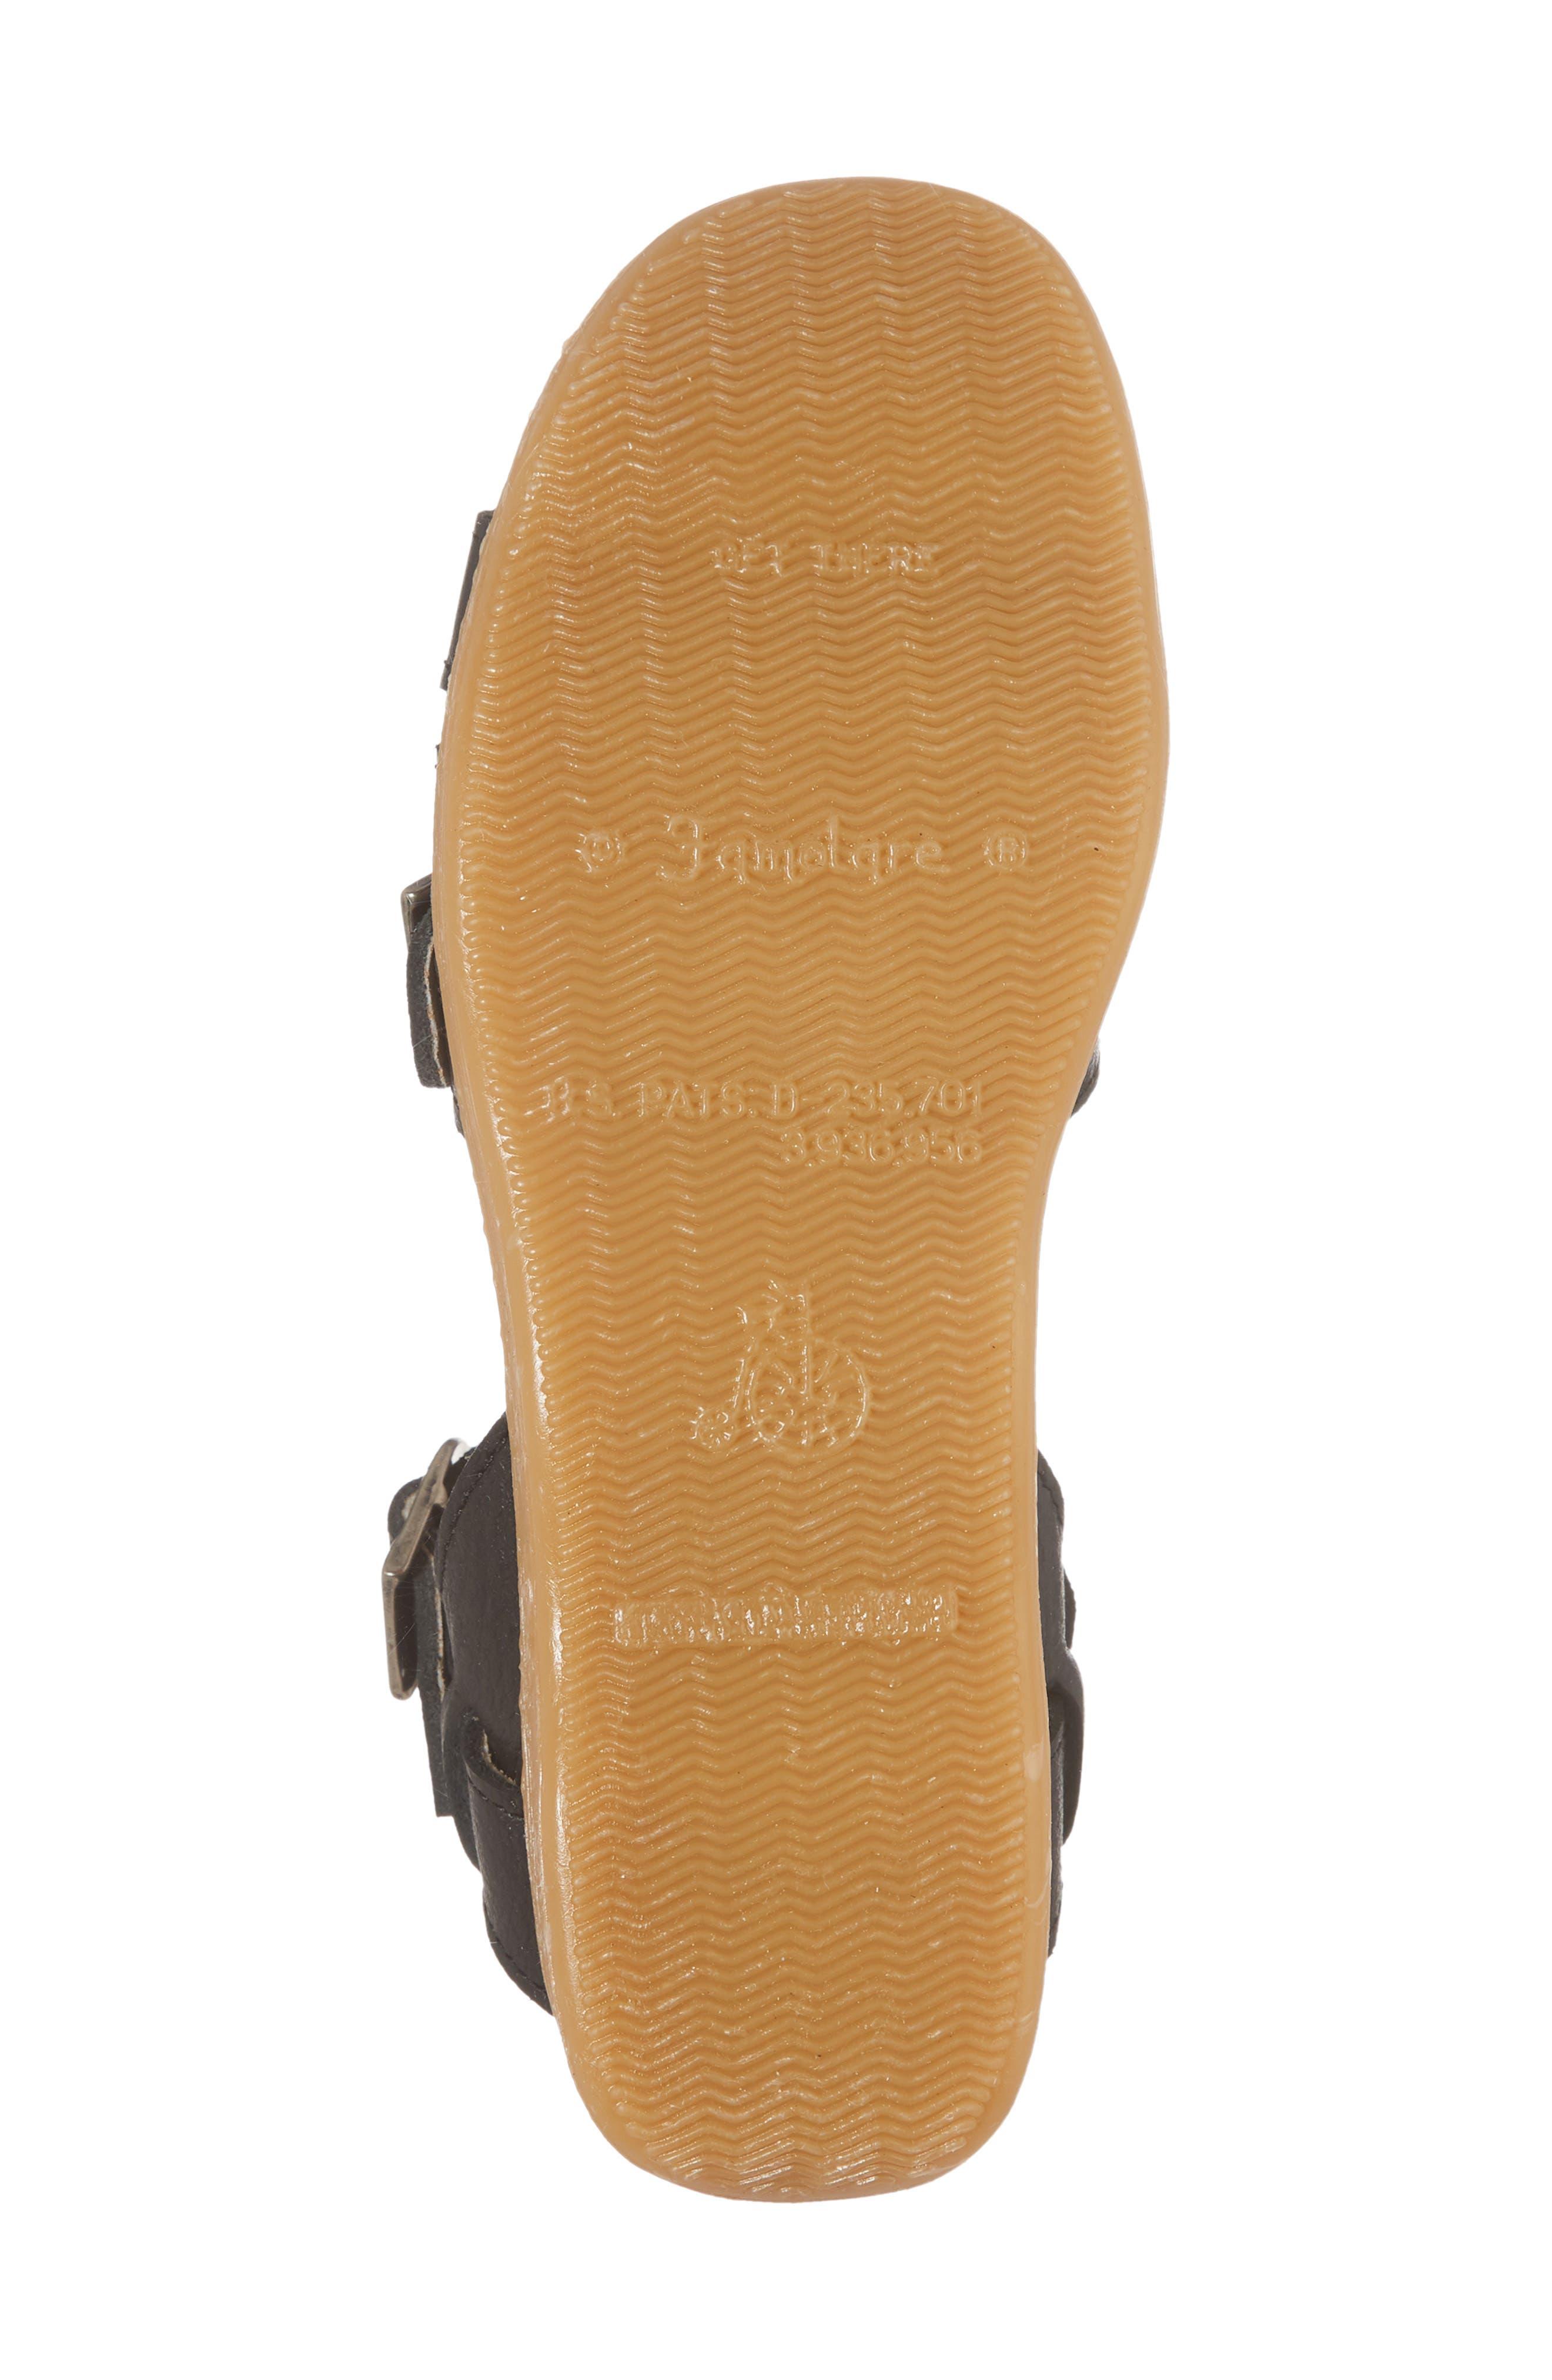 Honeybuckle Wedge Sandal,                             Alternate thumbnail 6, color,                             COAL LEATHER